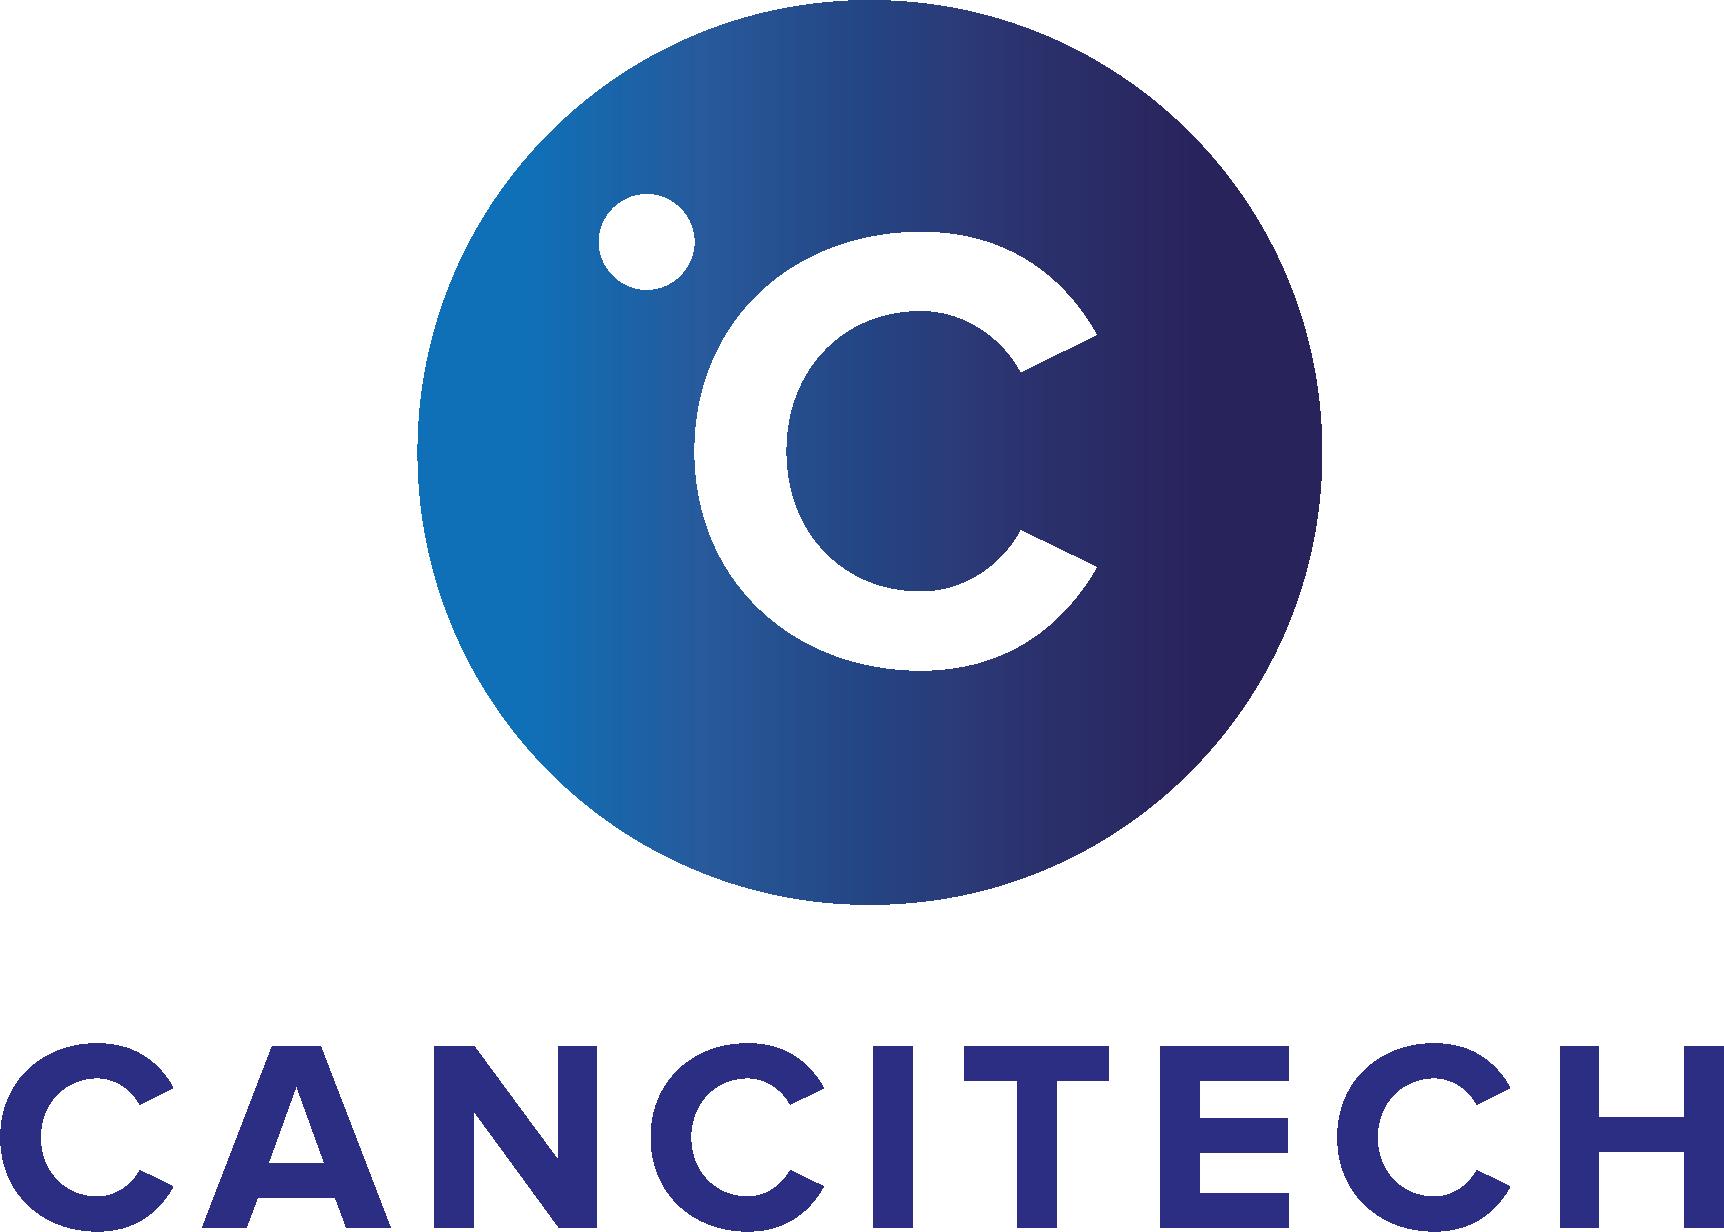 cancitech logo creuse